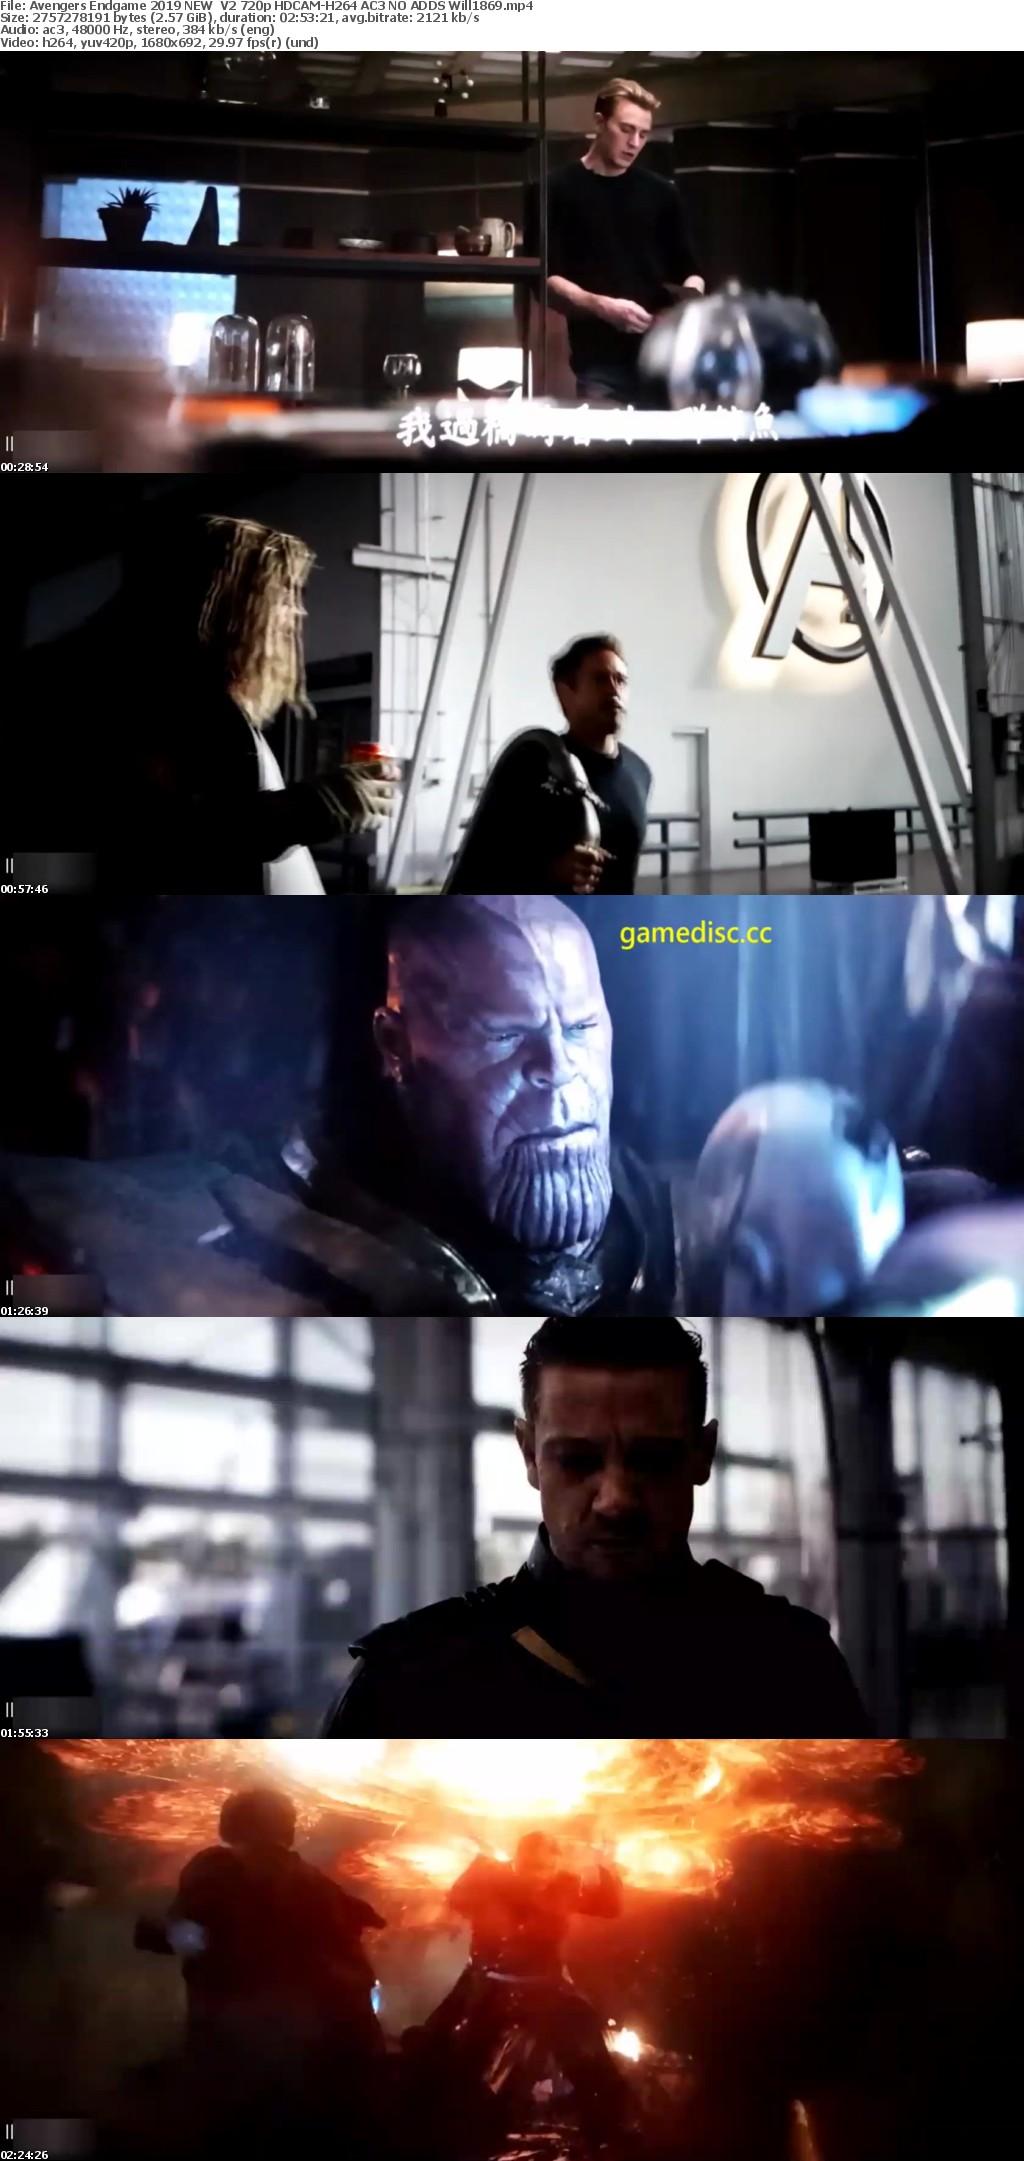 Avengers Endgame 2019 NEW V2 720p HDCAM-H264 AC3 NO ADDS Will1869